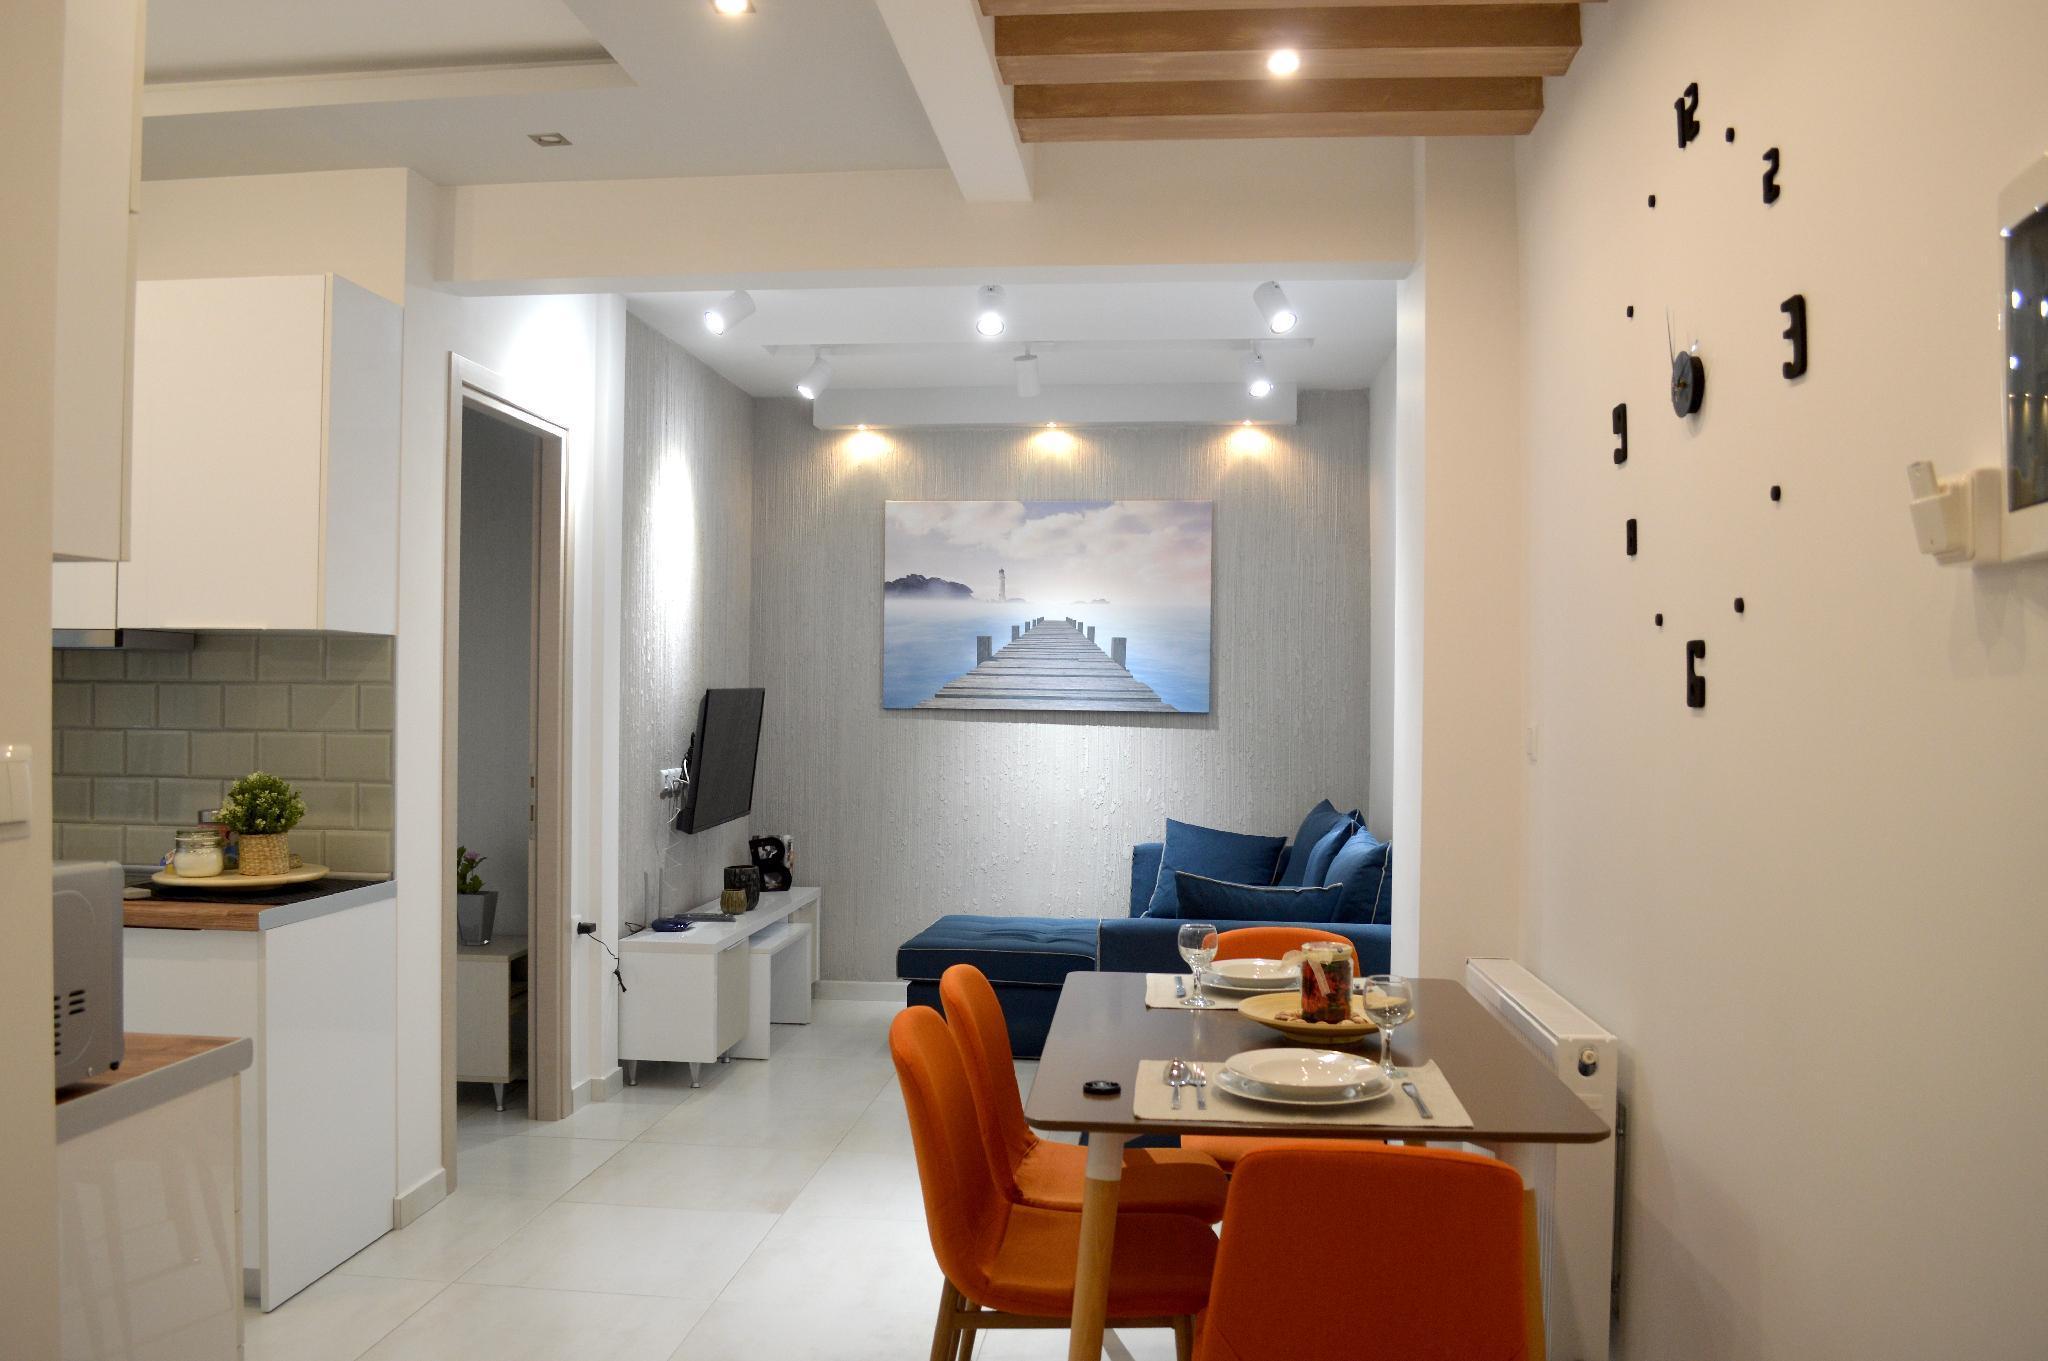 Euphoria Luxurious City Center Residence